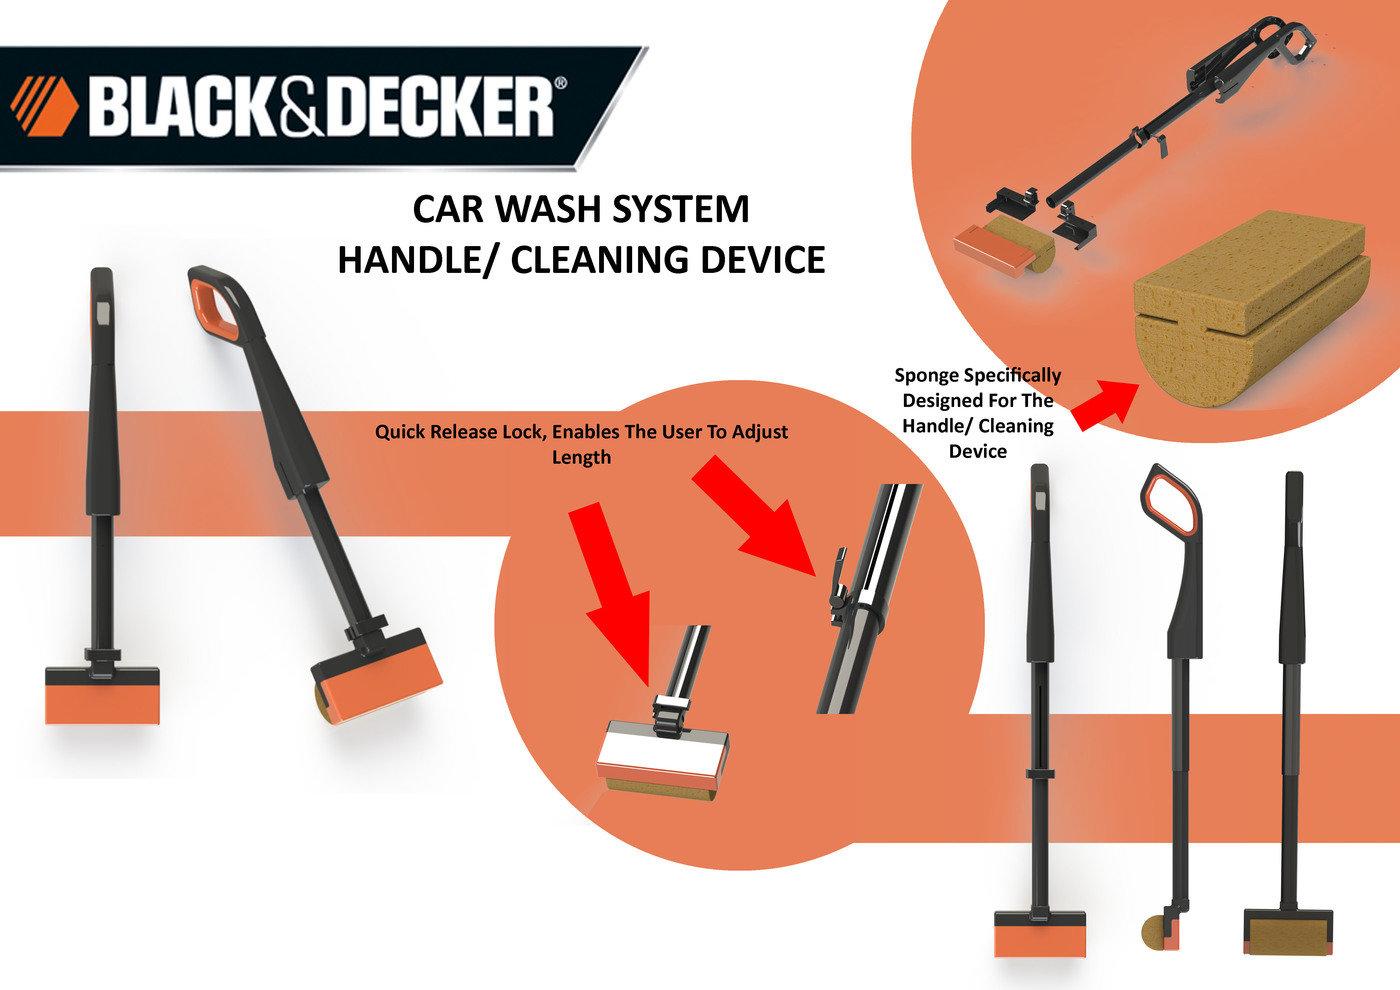 BLACK & DECKER Car Wash System by Elliot Mitchell at